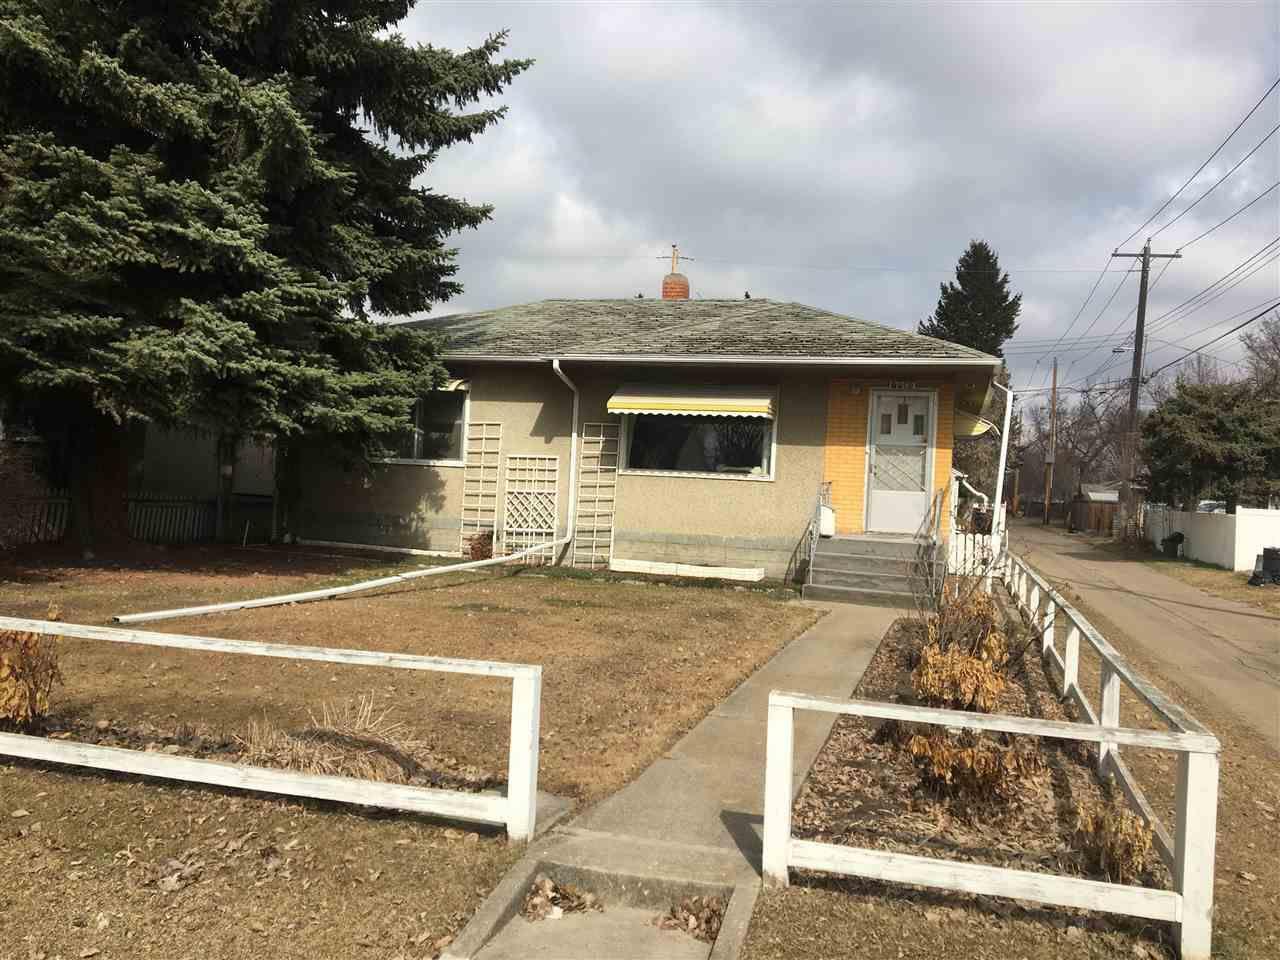 Main Photo: 7518 79 Avenue in Edmonton: Zone 17 House for sale : MLS®# E4151768